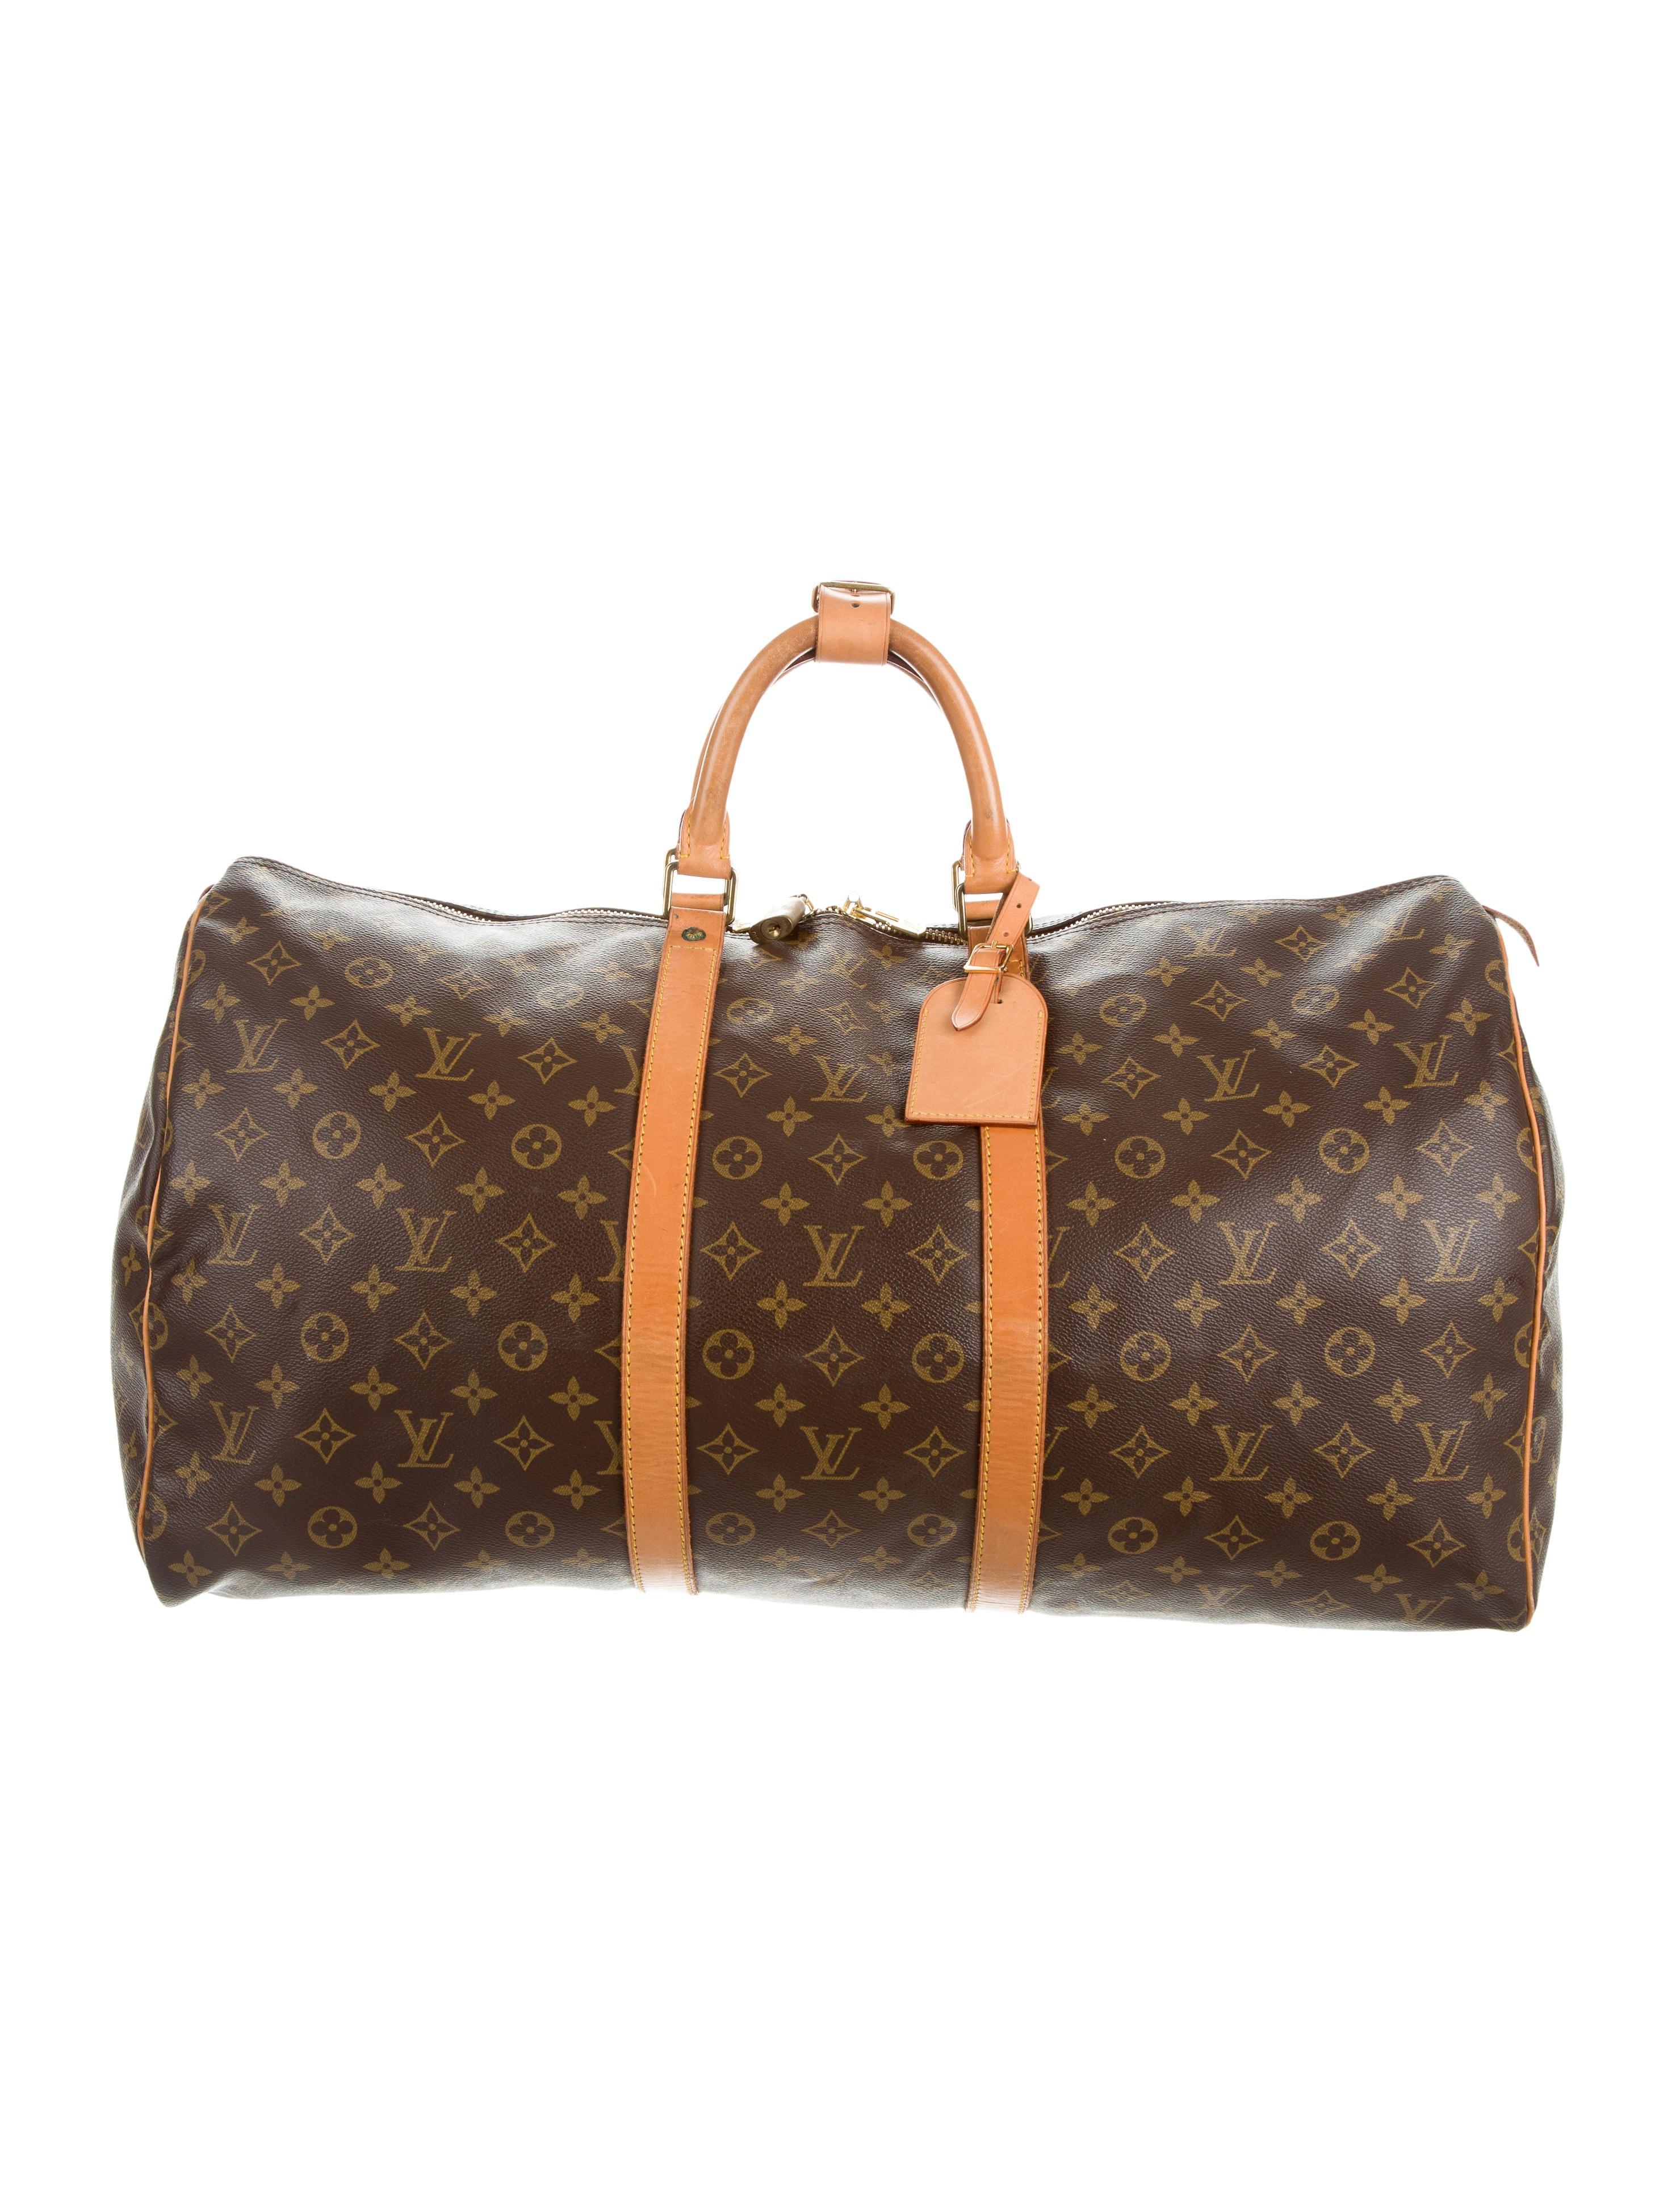 louis vuitton monogram keepall 55 handbags lou121222. Black Bedroom Furniture Sets. Home Design Ideas